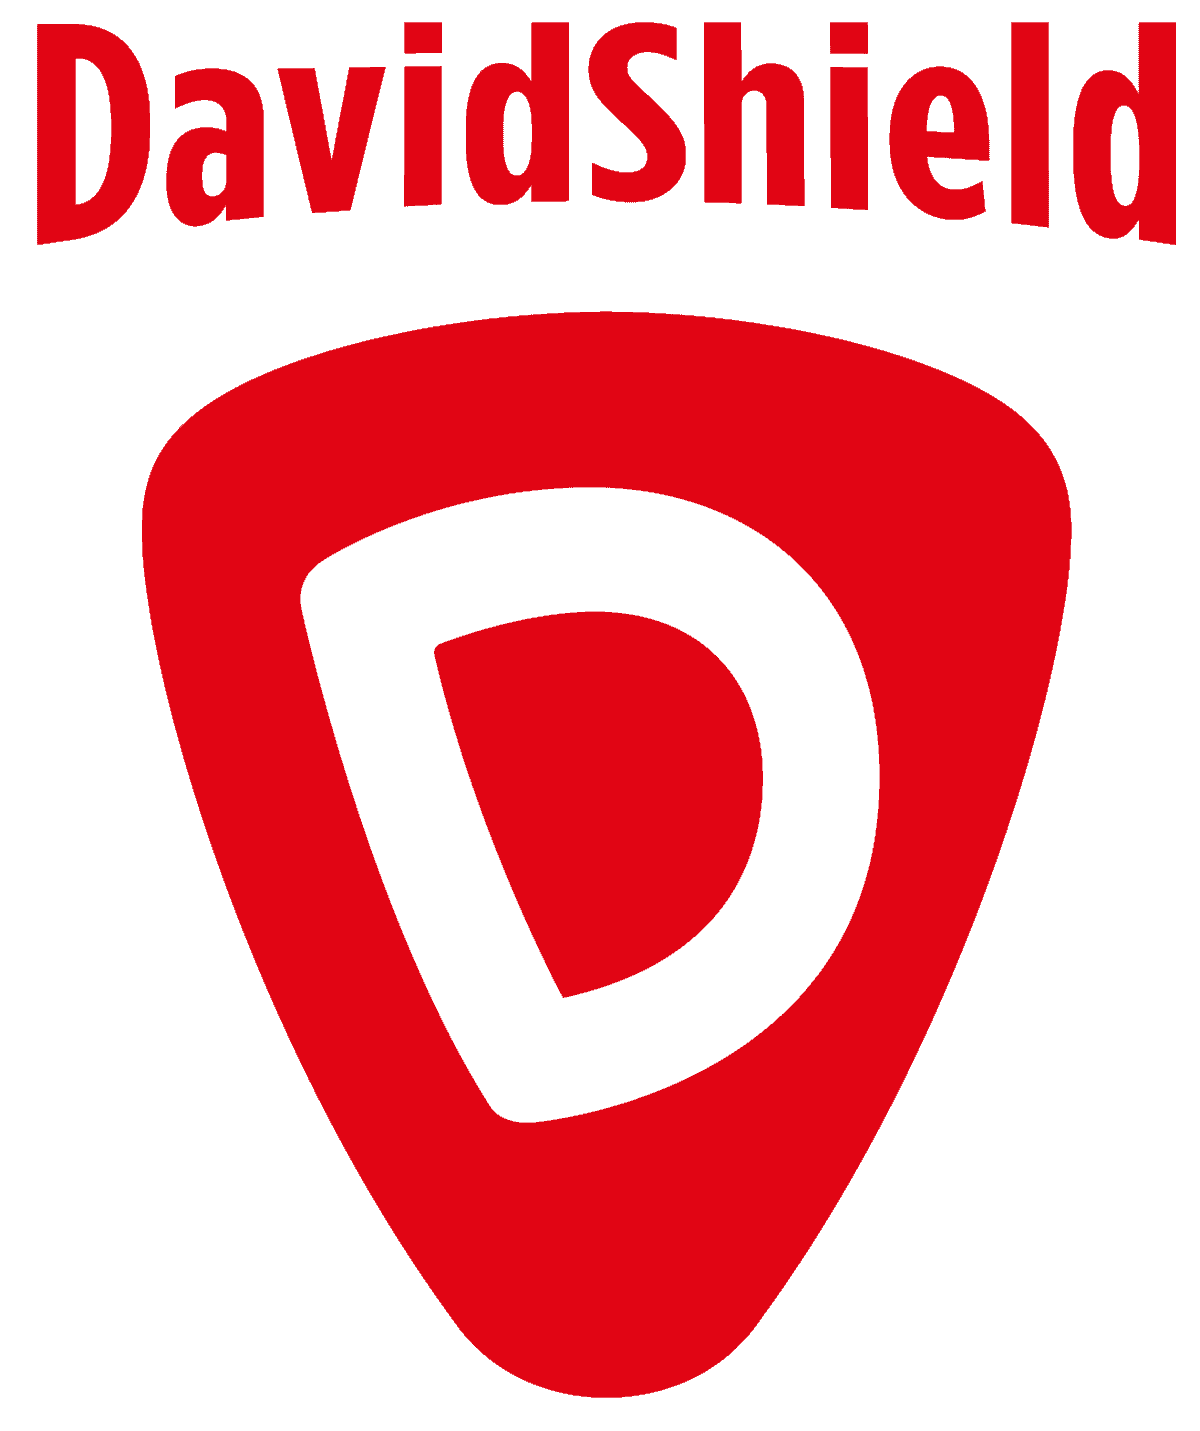 דיוידשילד